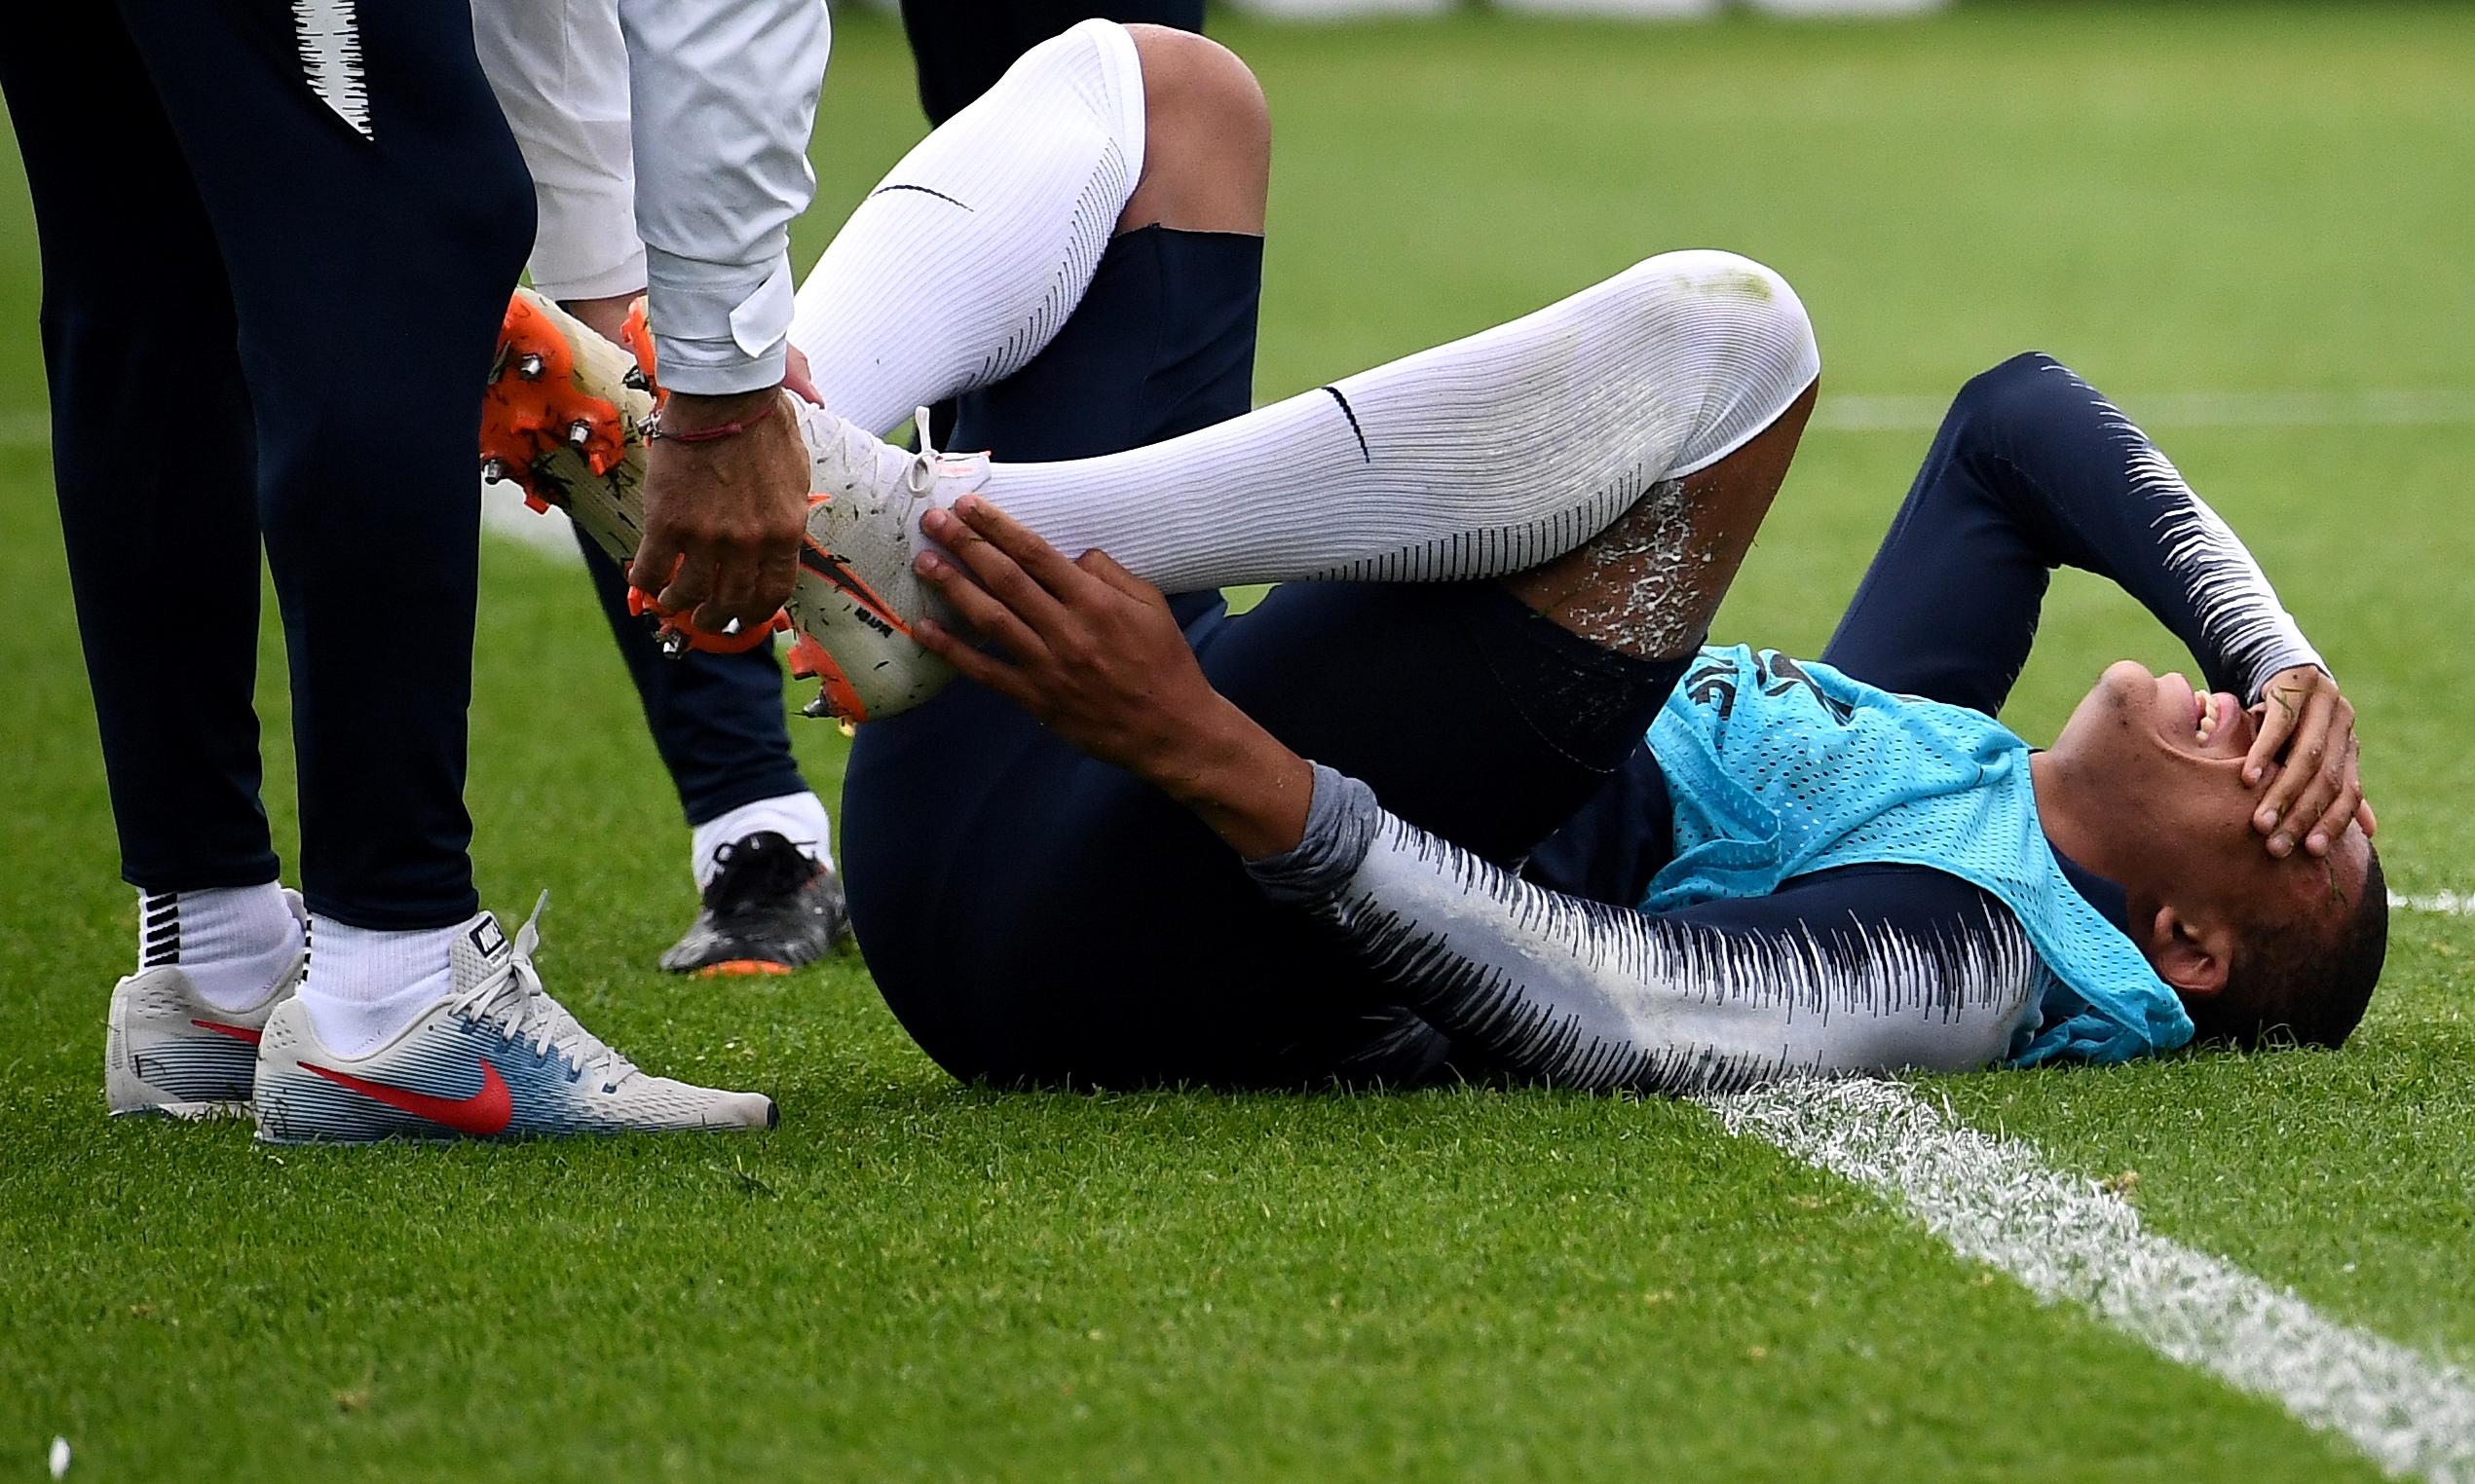 Image result for เอ็มบัปเปเจ็บข้อเท้าเลิกซ้อมกลางคัน